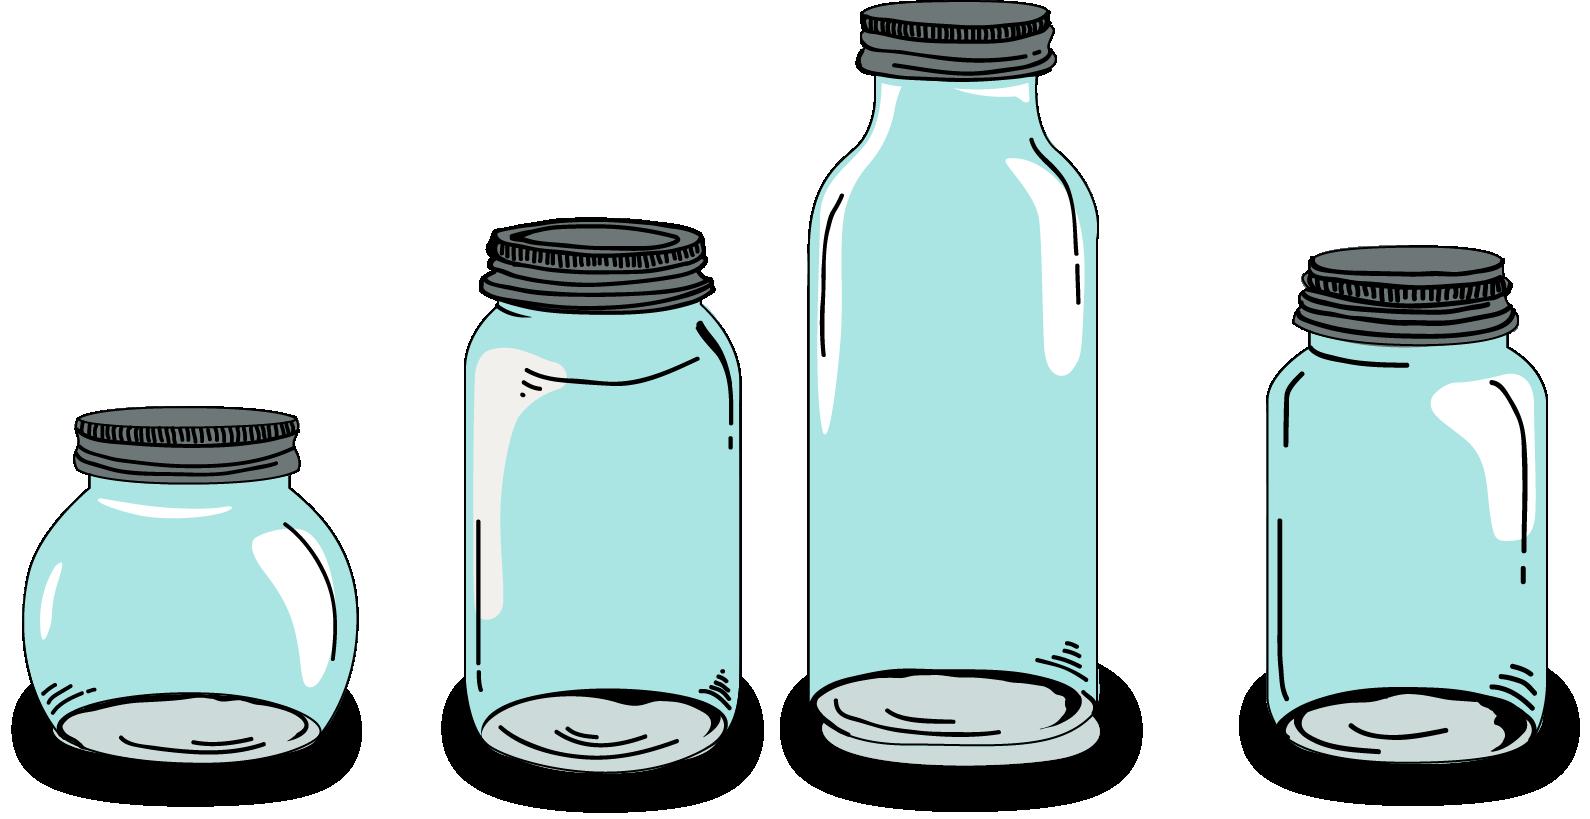 Mason Jar Vector Download at GetDrawings | Free download